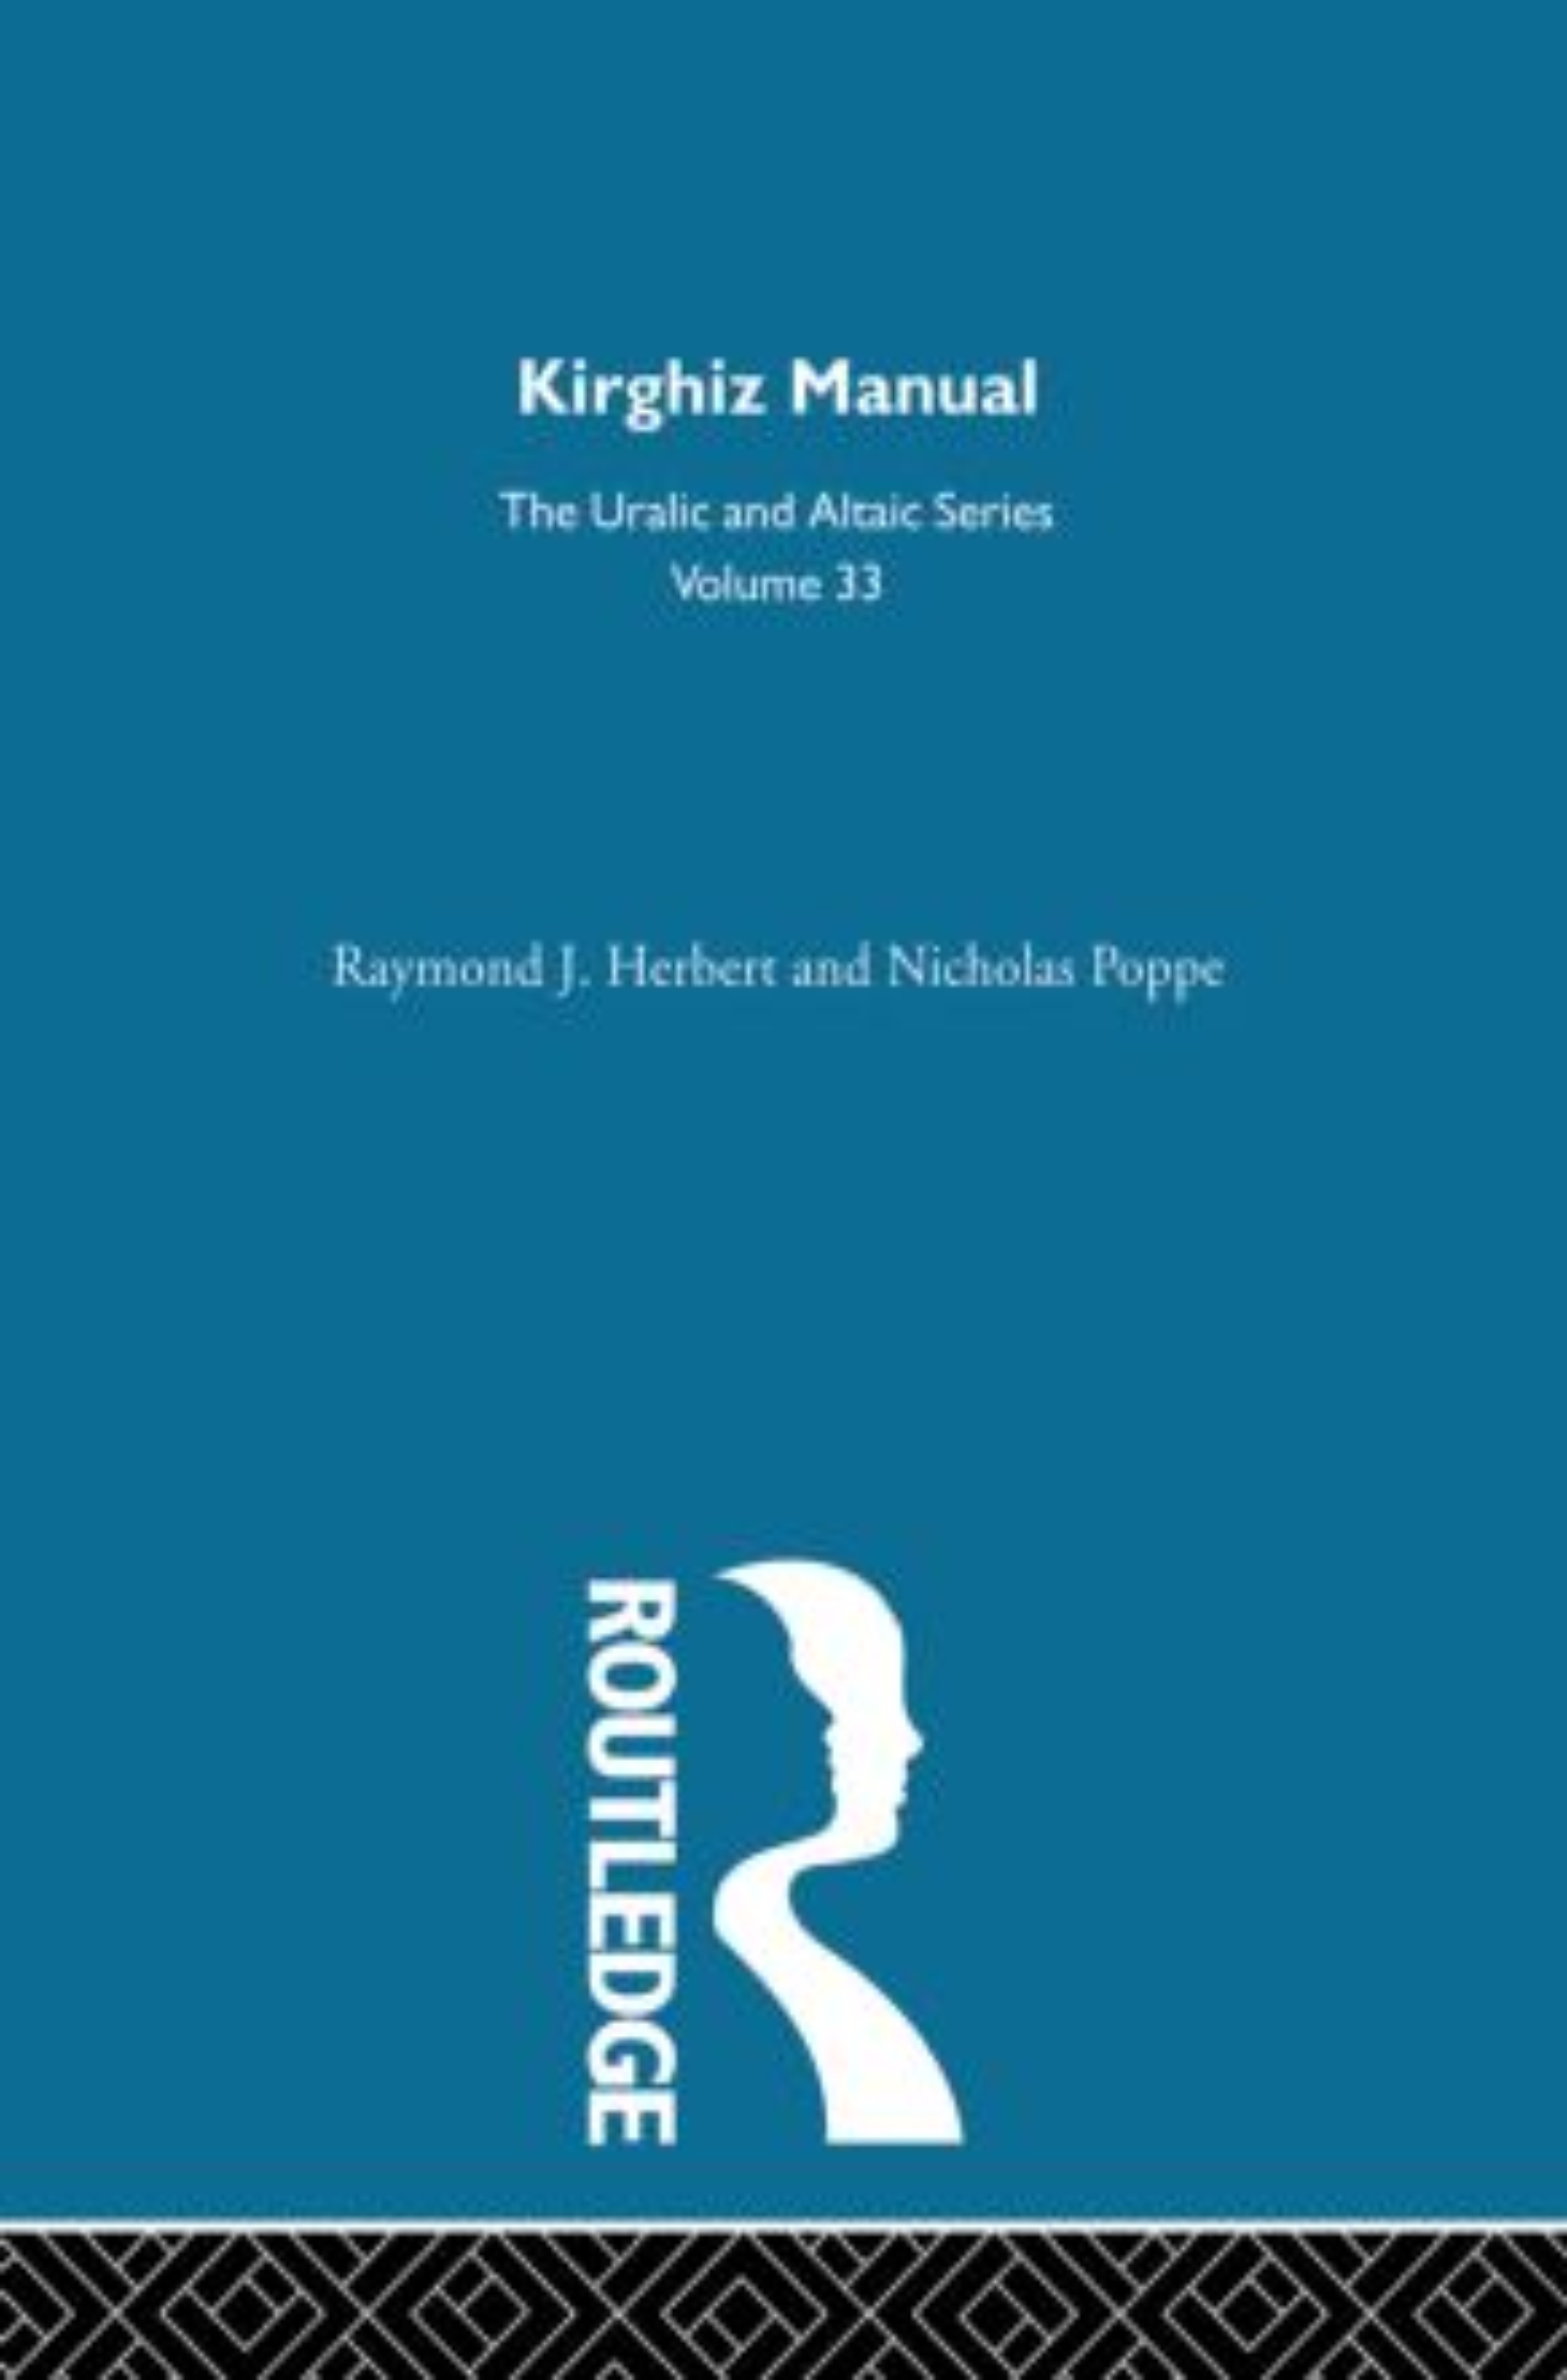 Kirghiz Manual